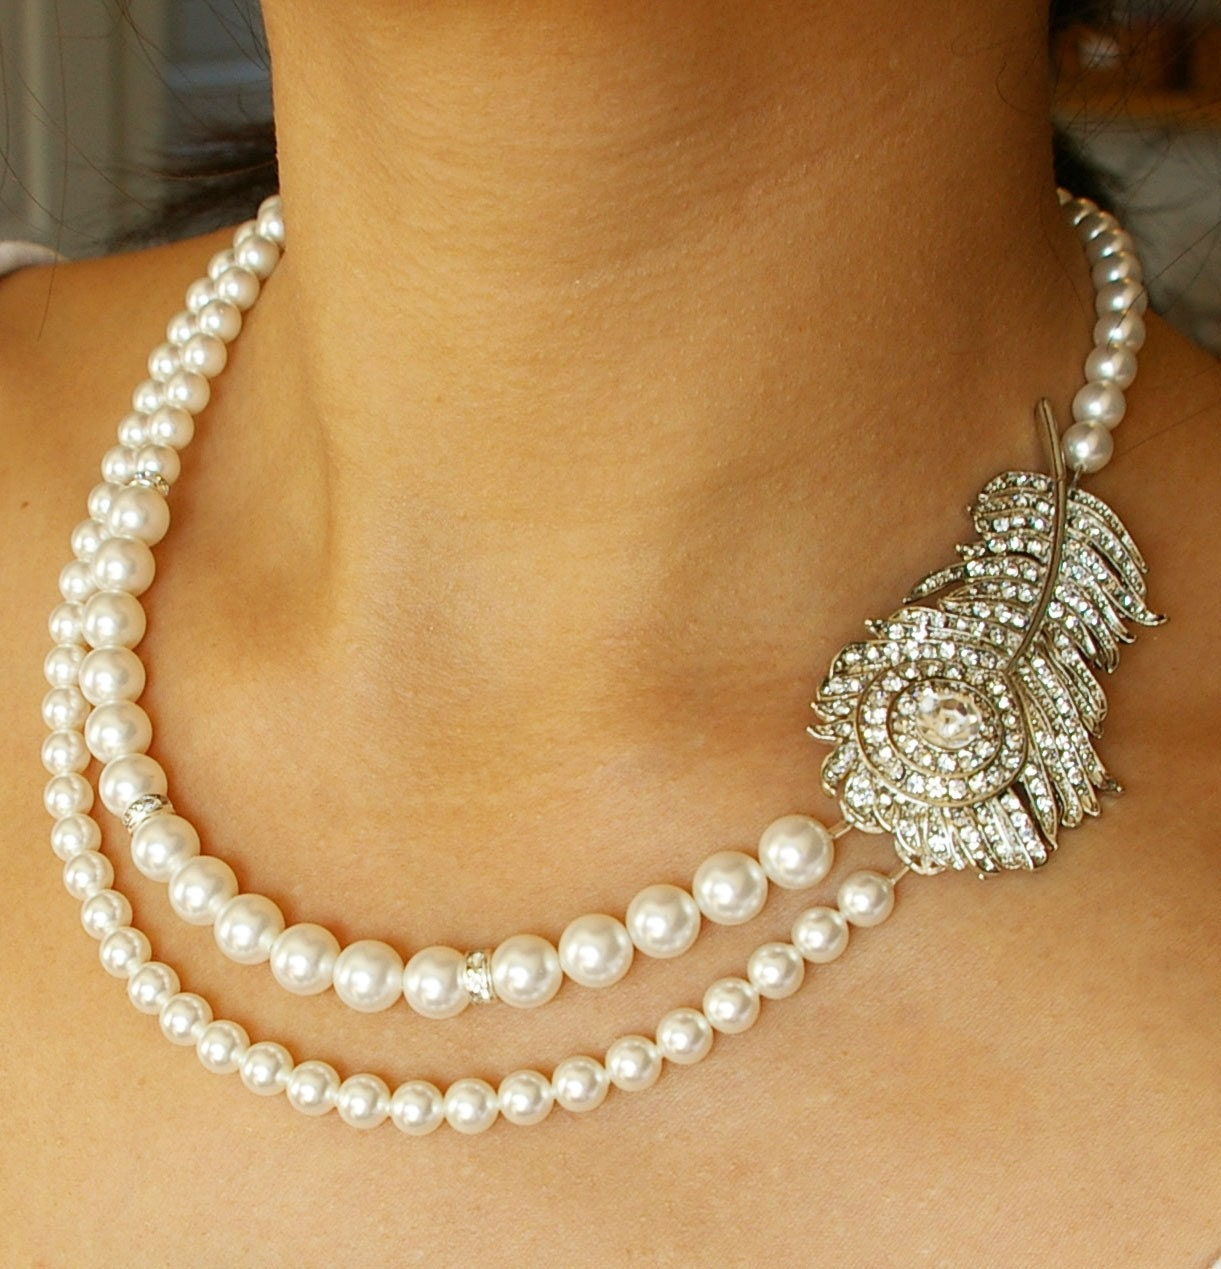 peacock bridal necklace vintage wedding necklace ivory pearl